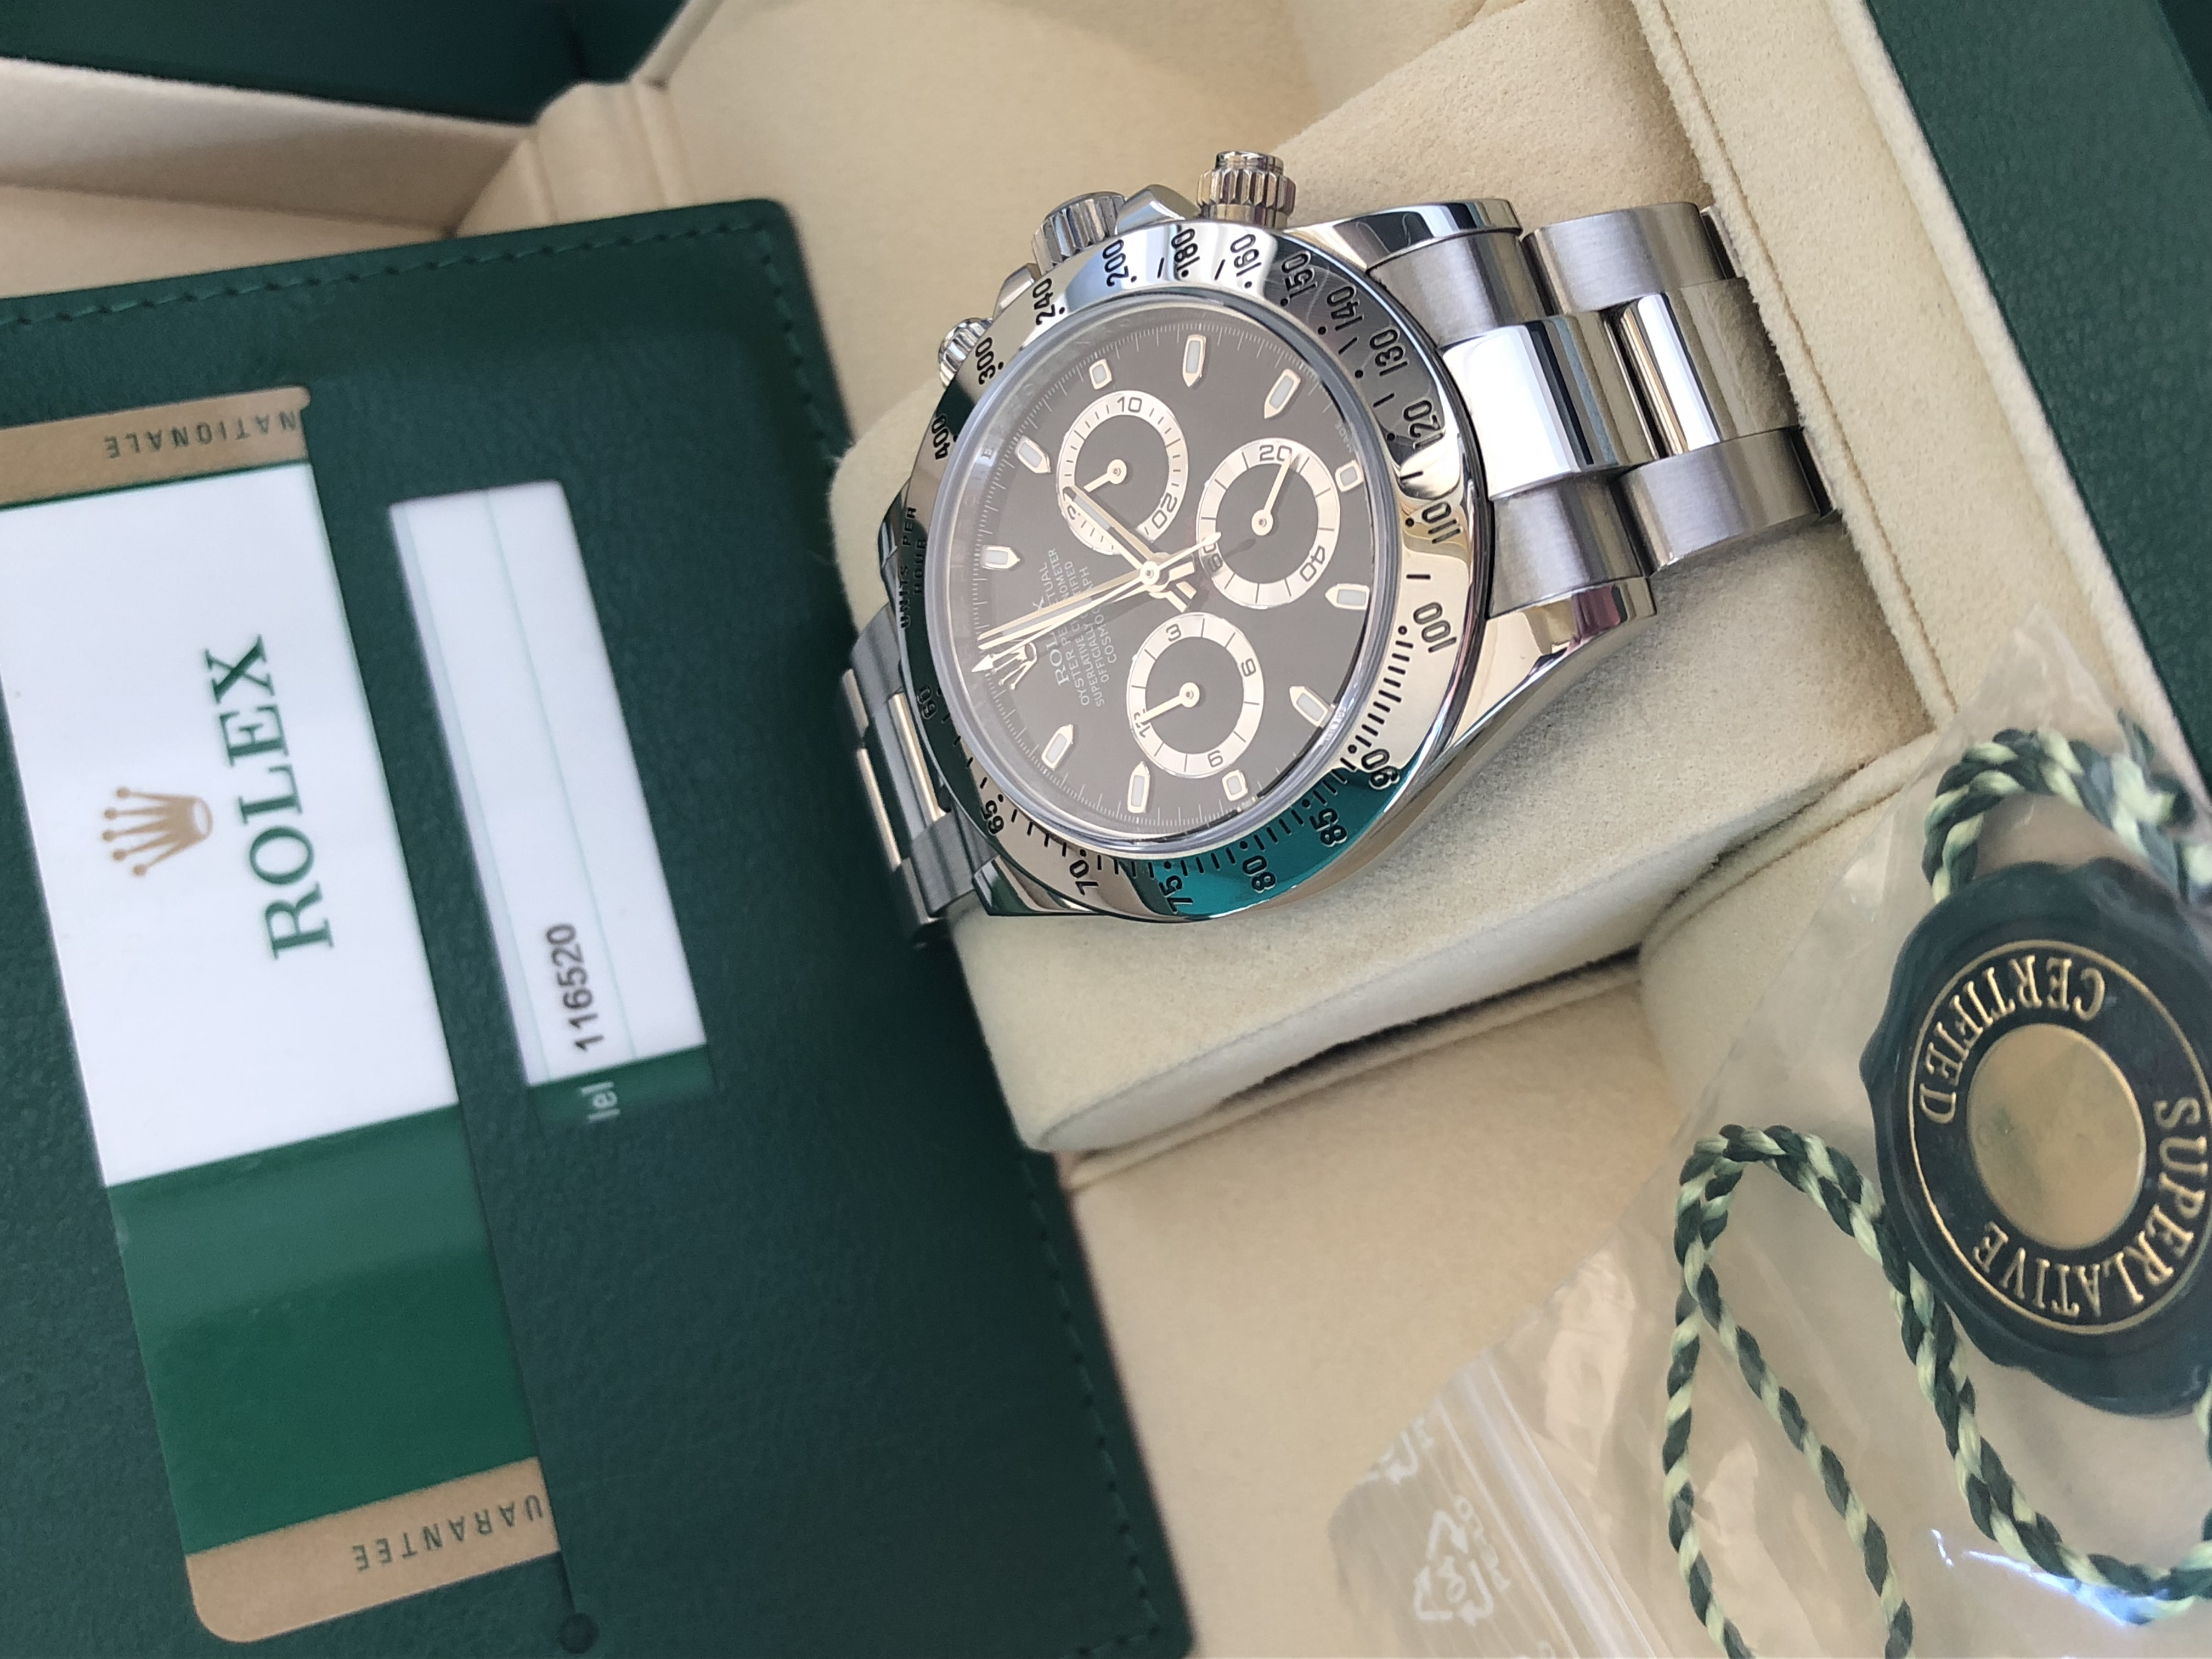 Rolex Chronograph Daytona 116520 Chromalight Dial